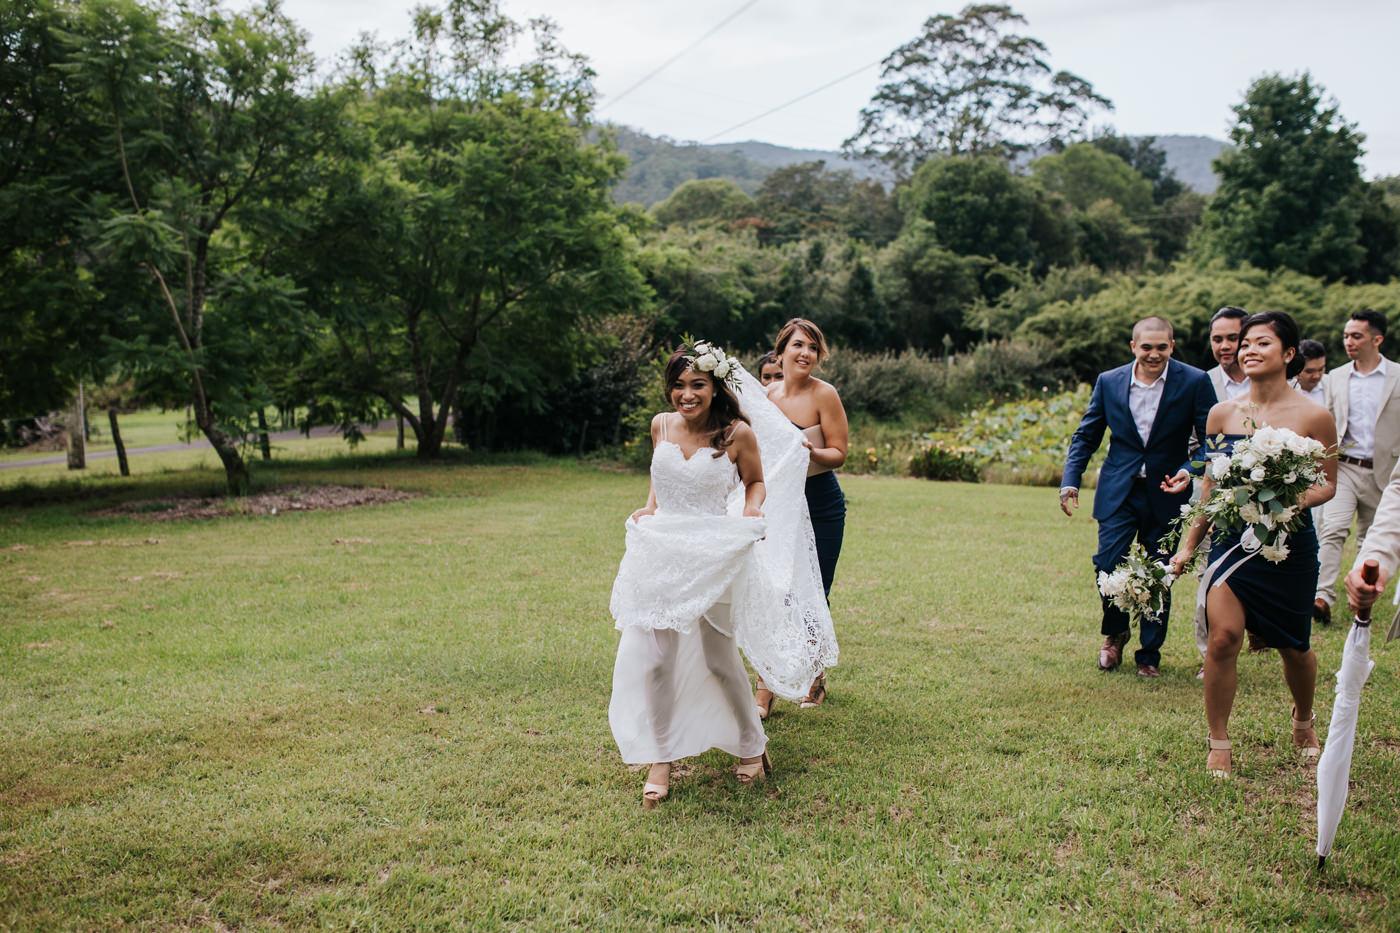 Nick & Vanezza - Fernbank Farm Wedding - Samantha Heather Photography-90.jpg